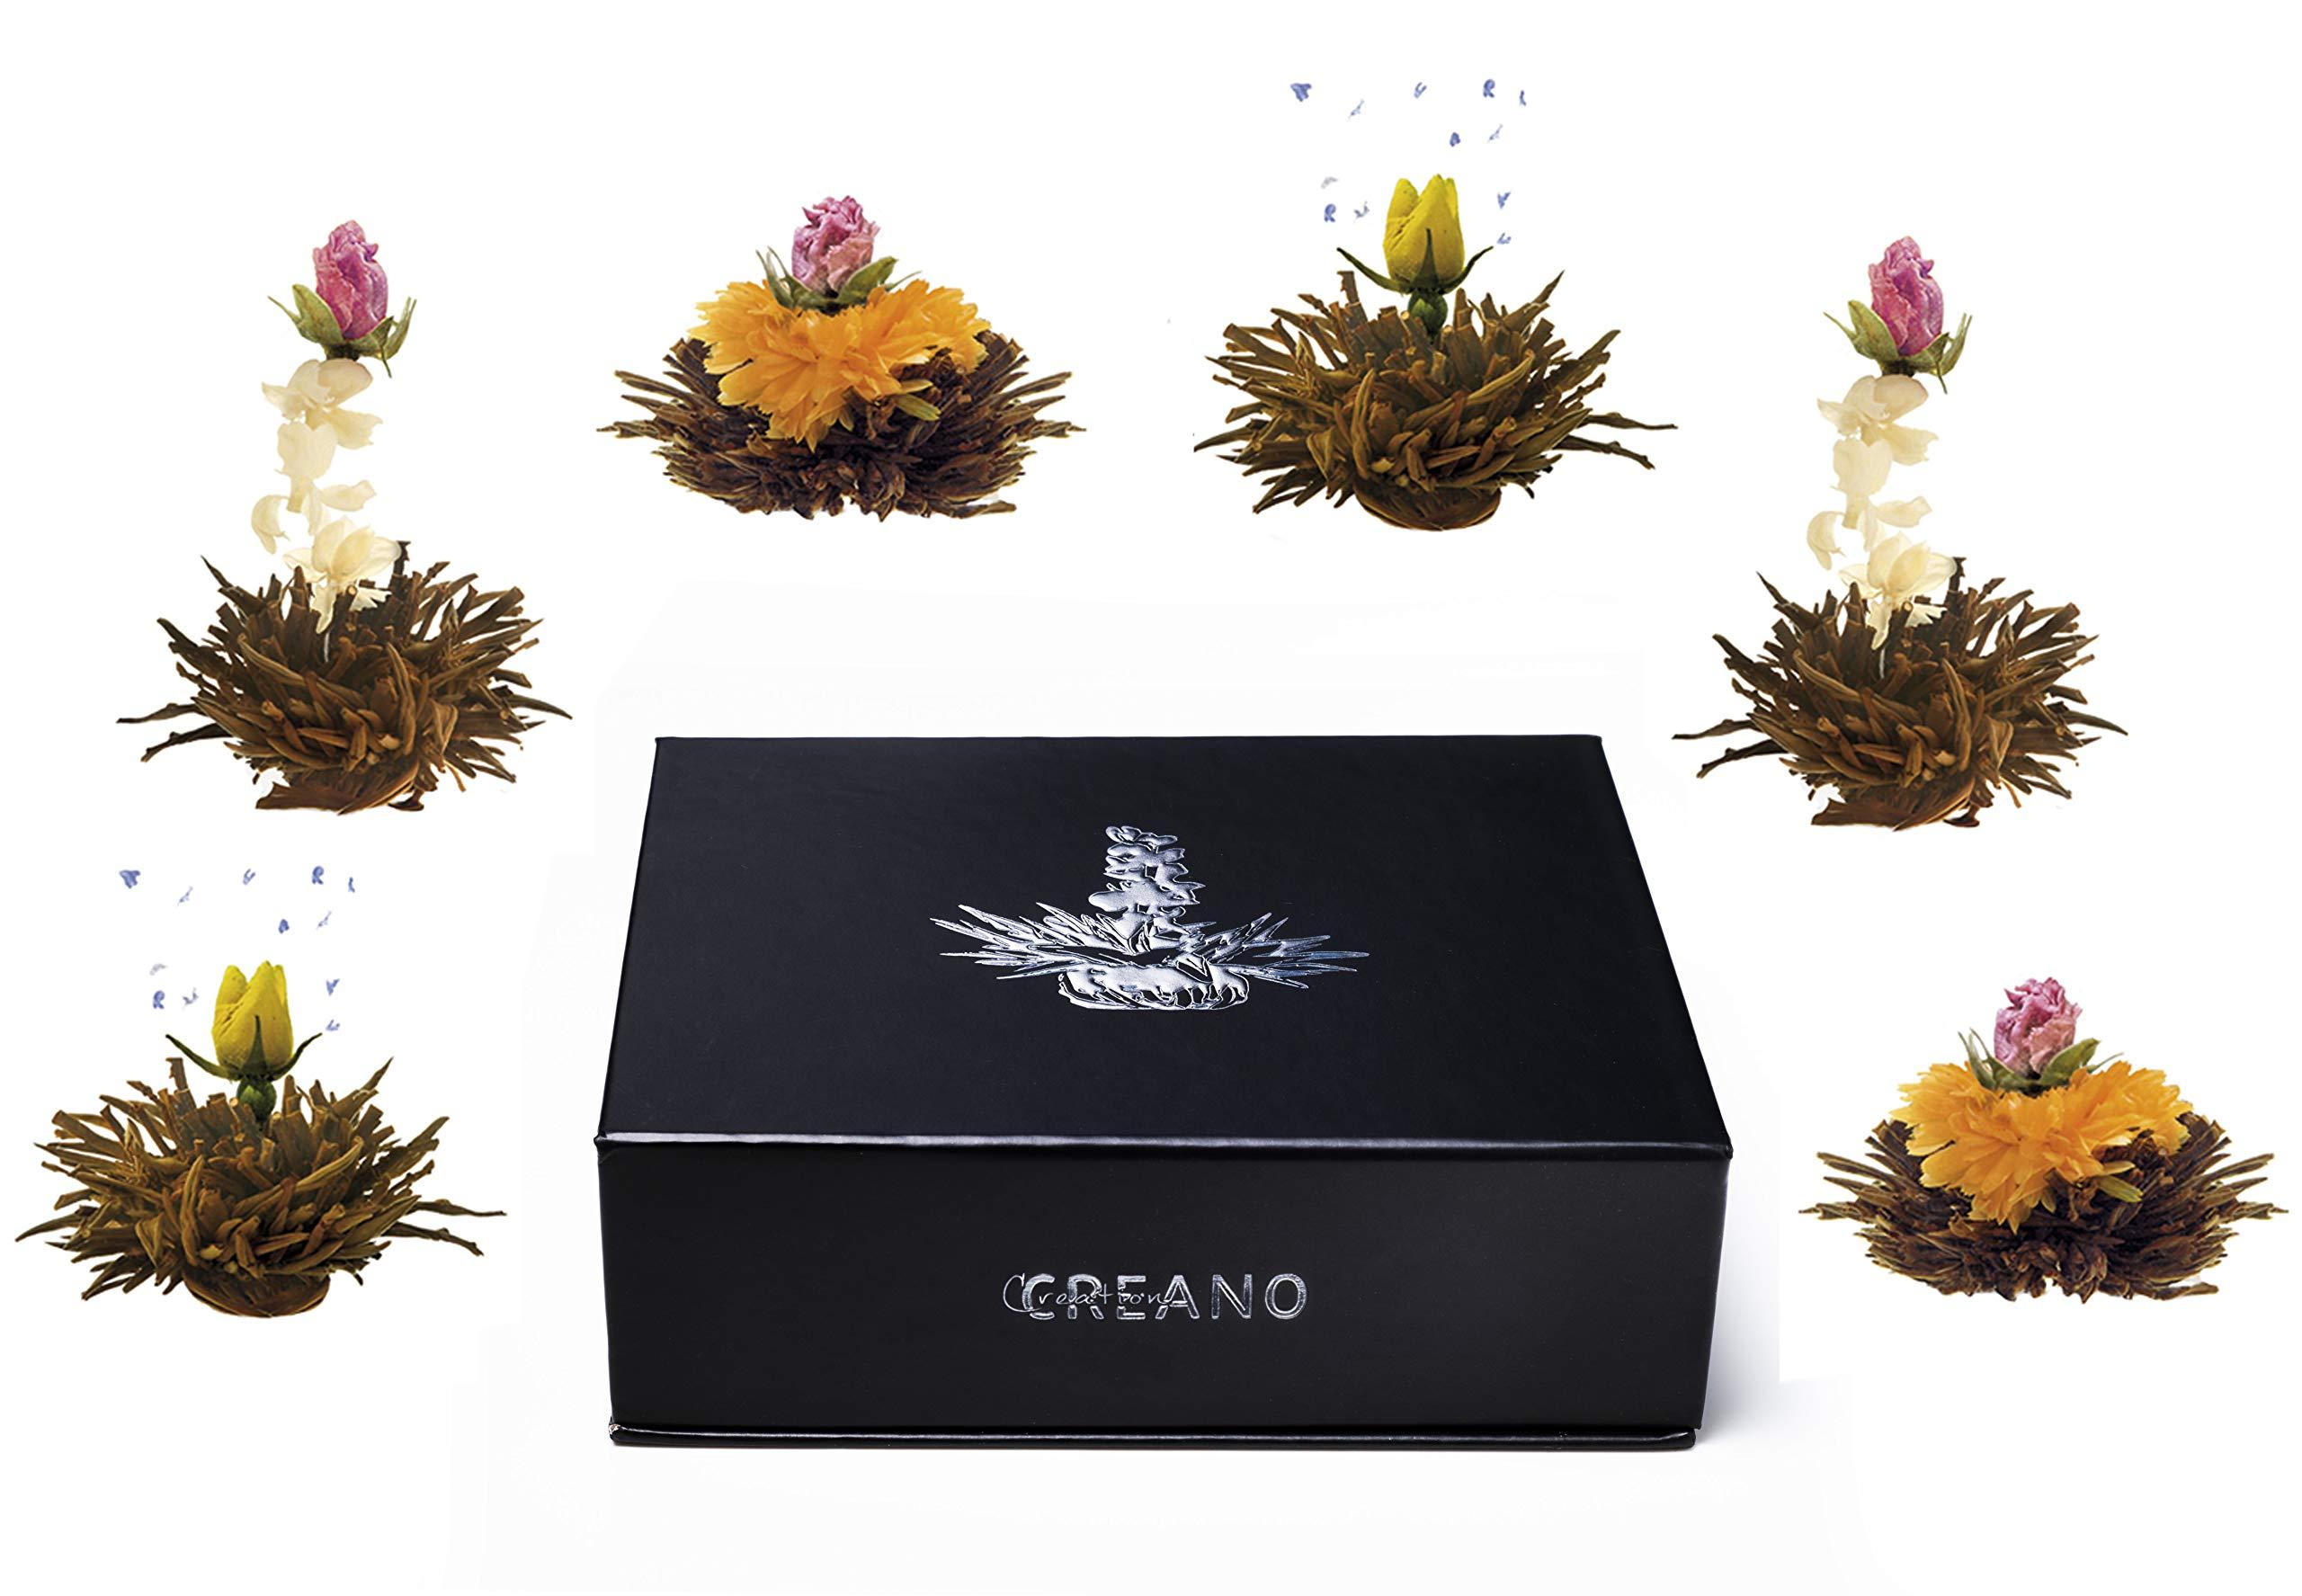 Creano-Teeblumen-Mix